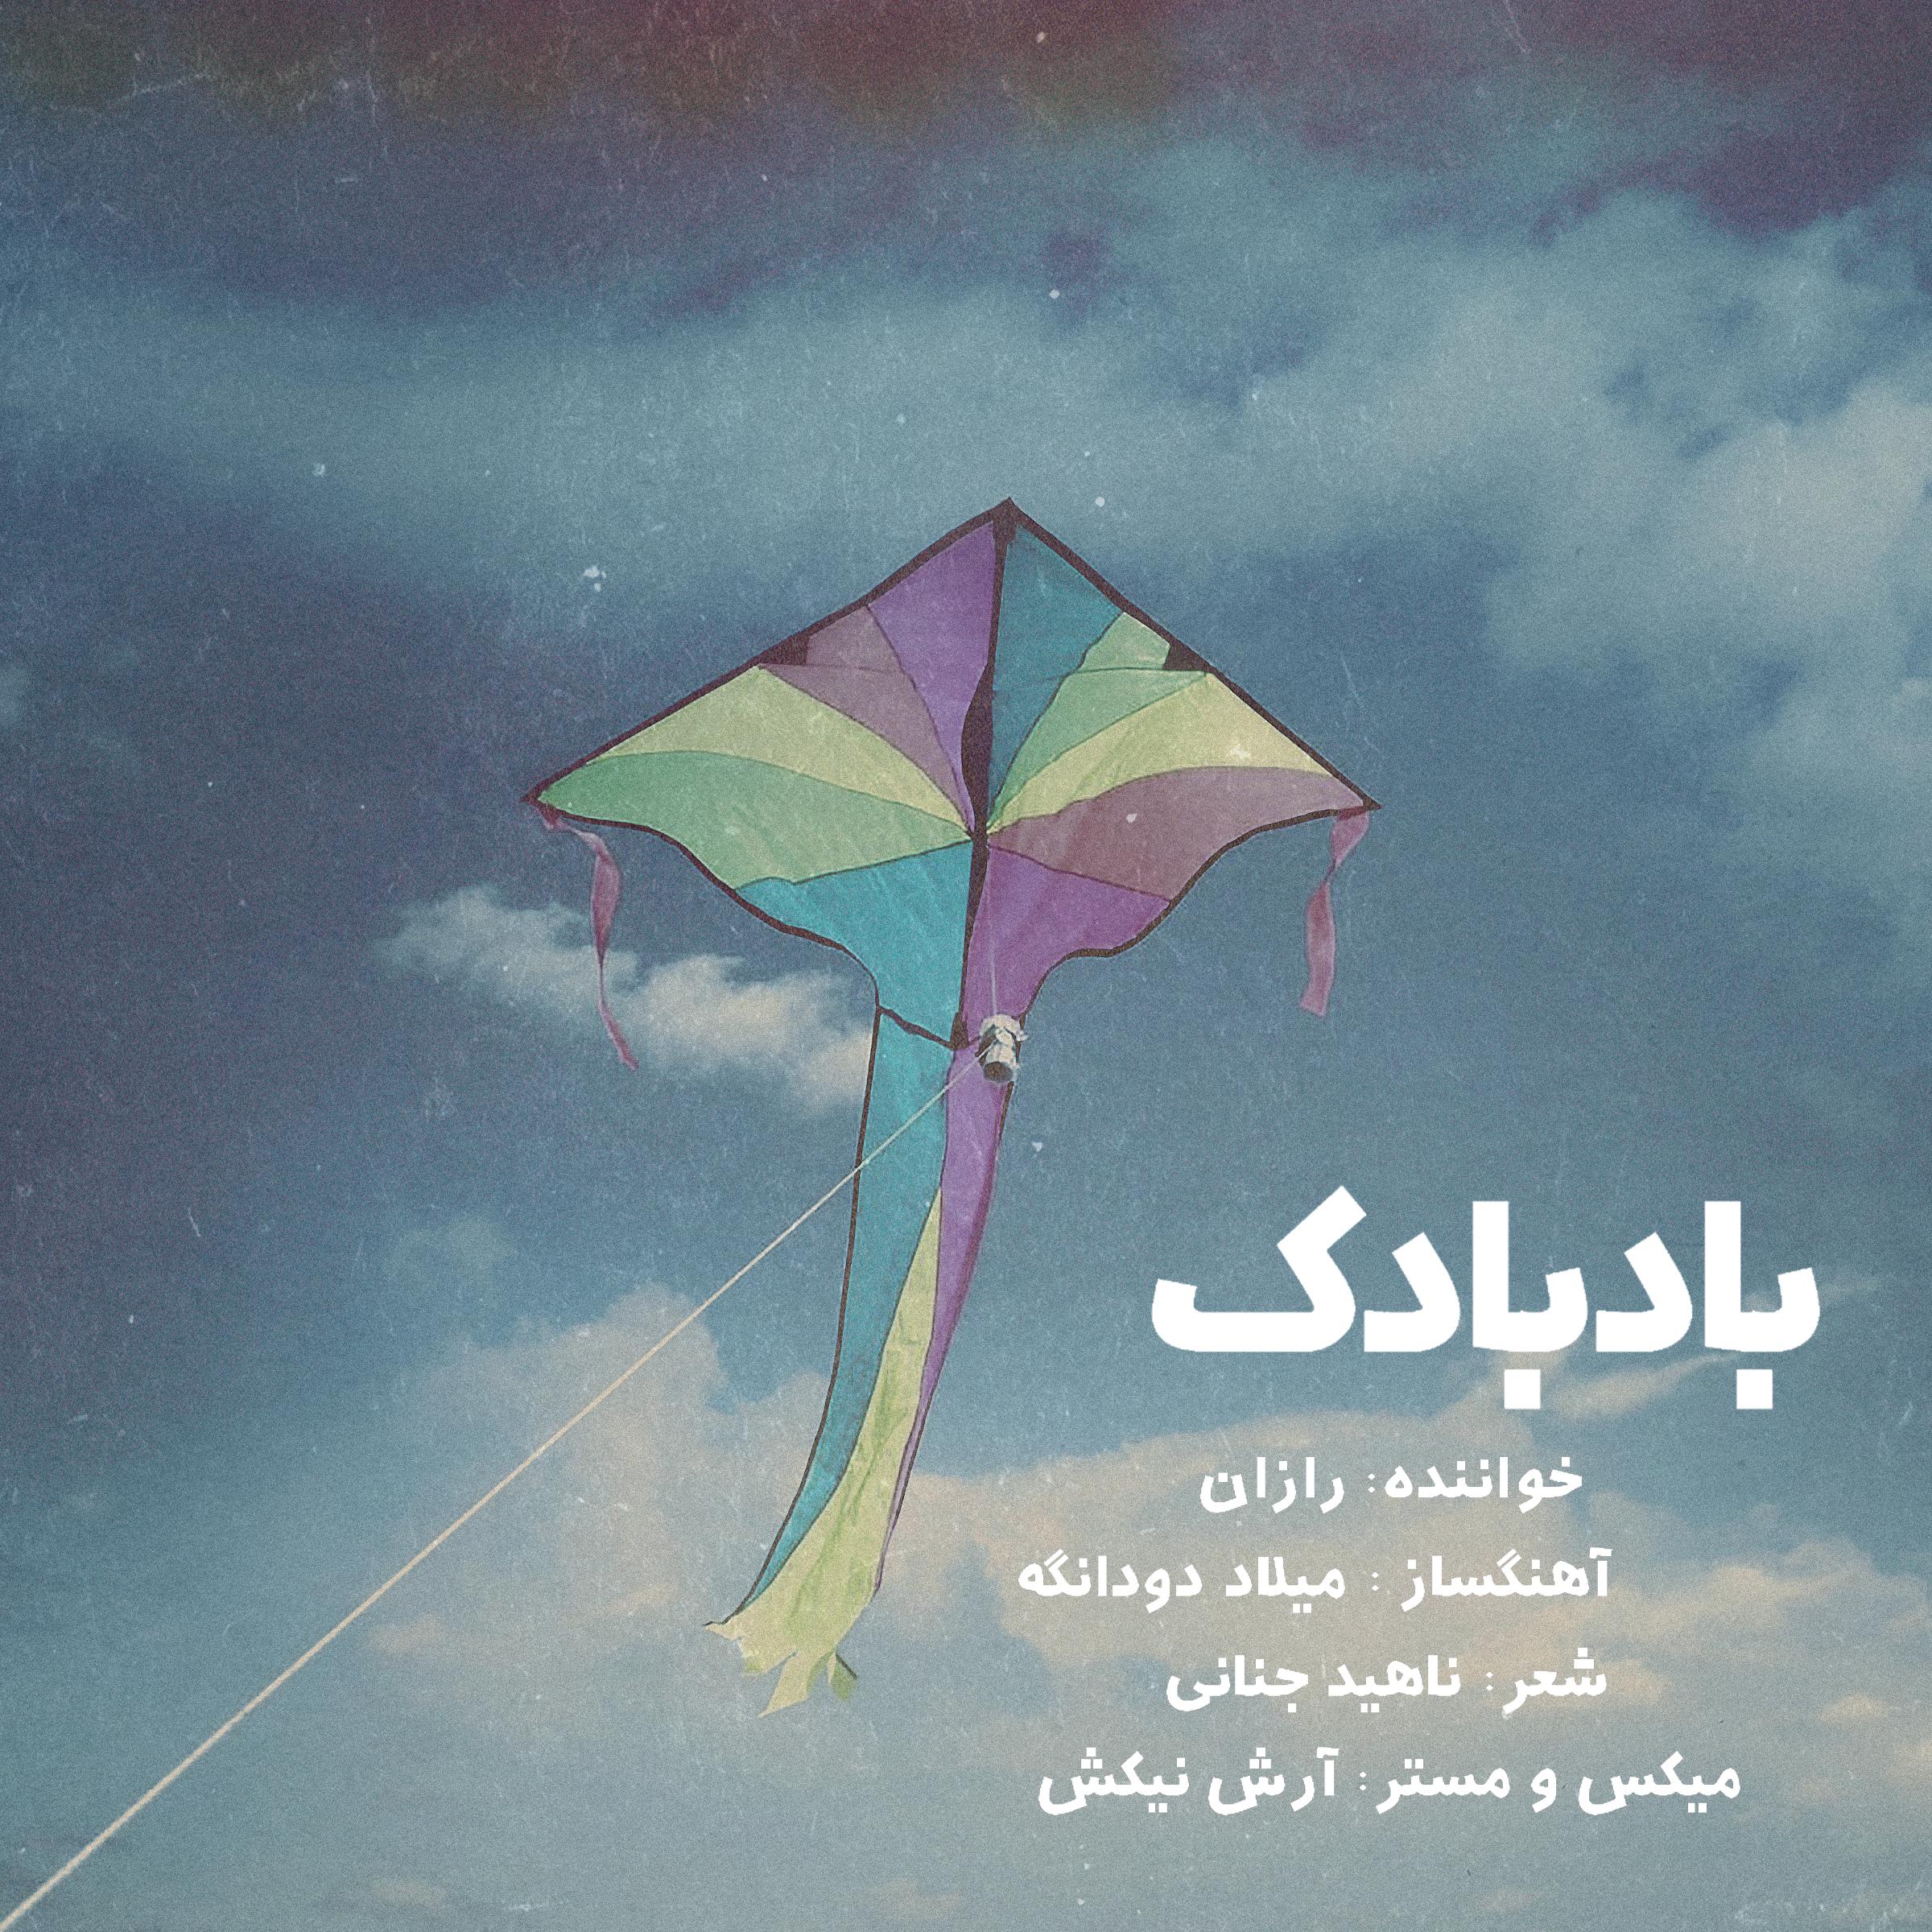 Razan – Badbadak